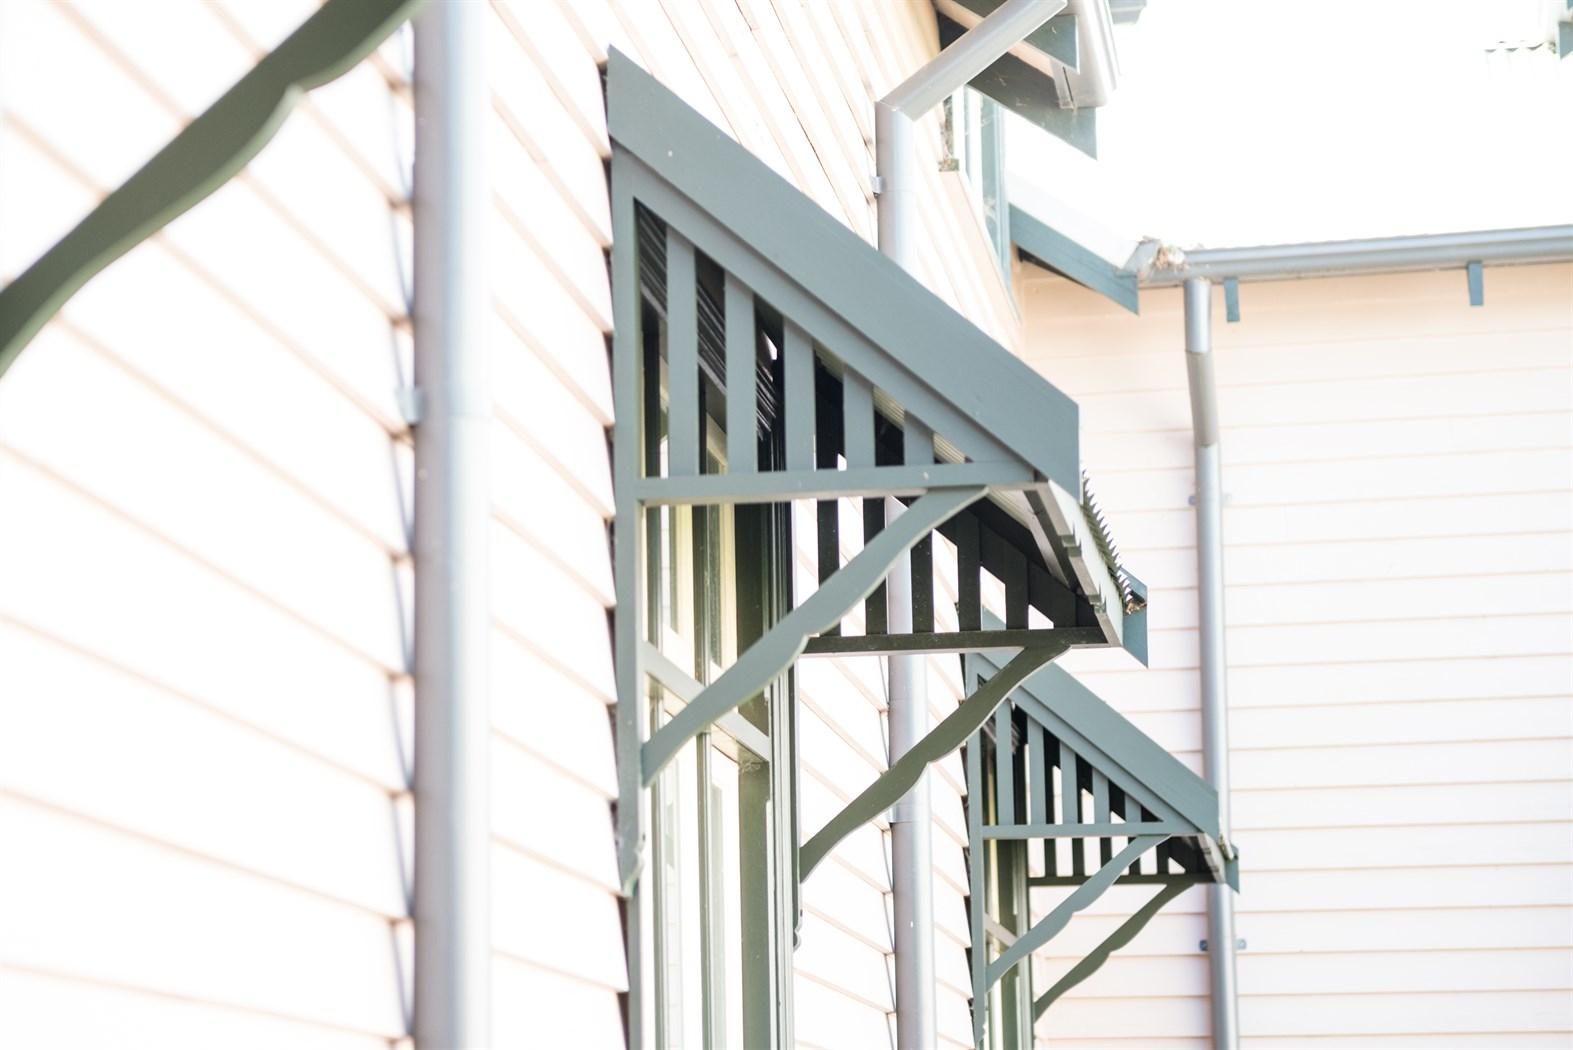 Heritage Timber Window Canopies